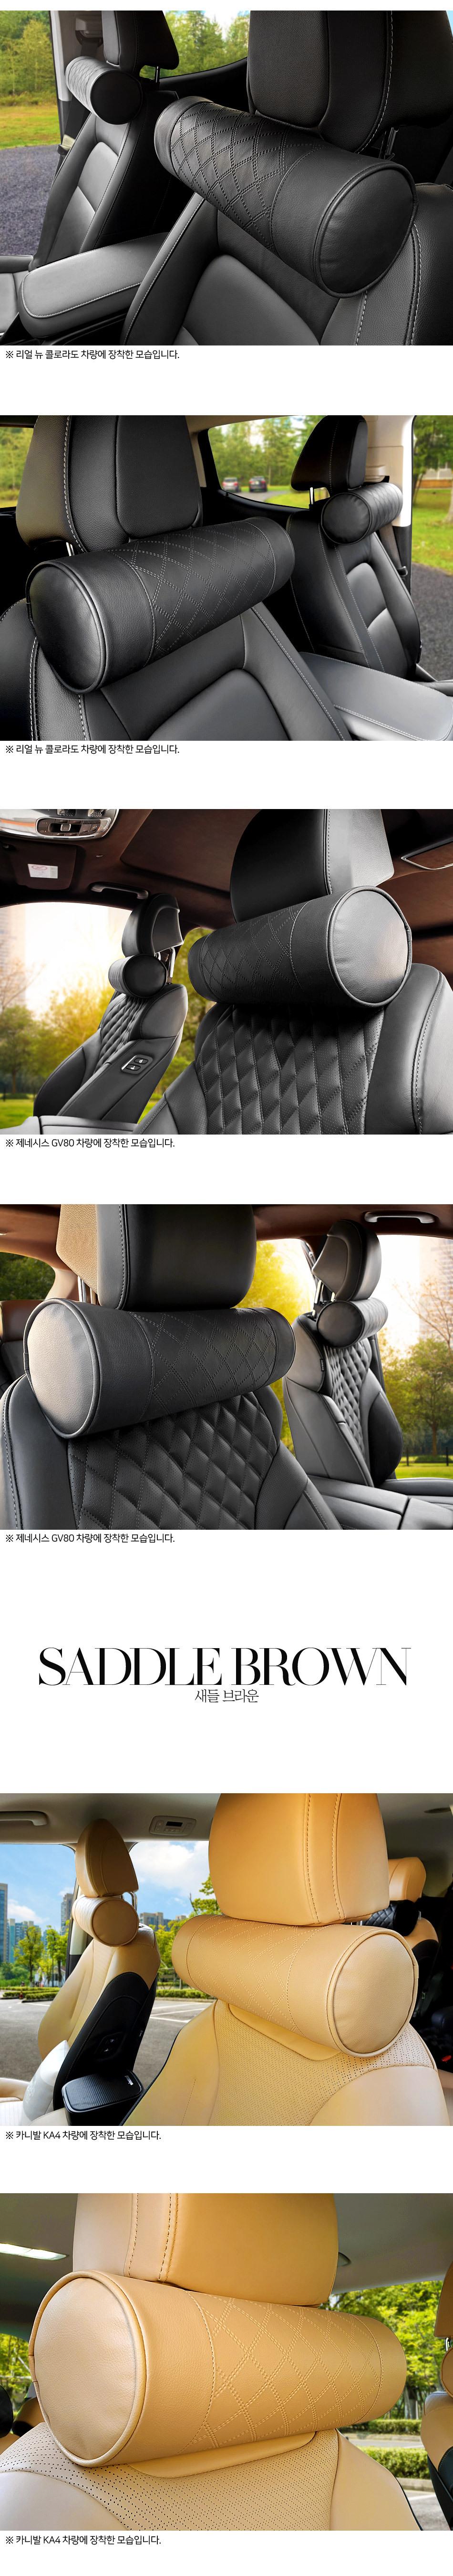 akan-leather-wide-neck-cushion_04.jpg